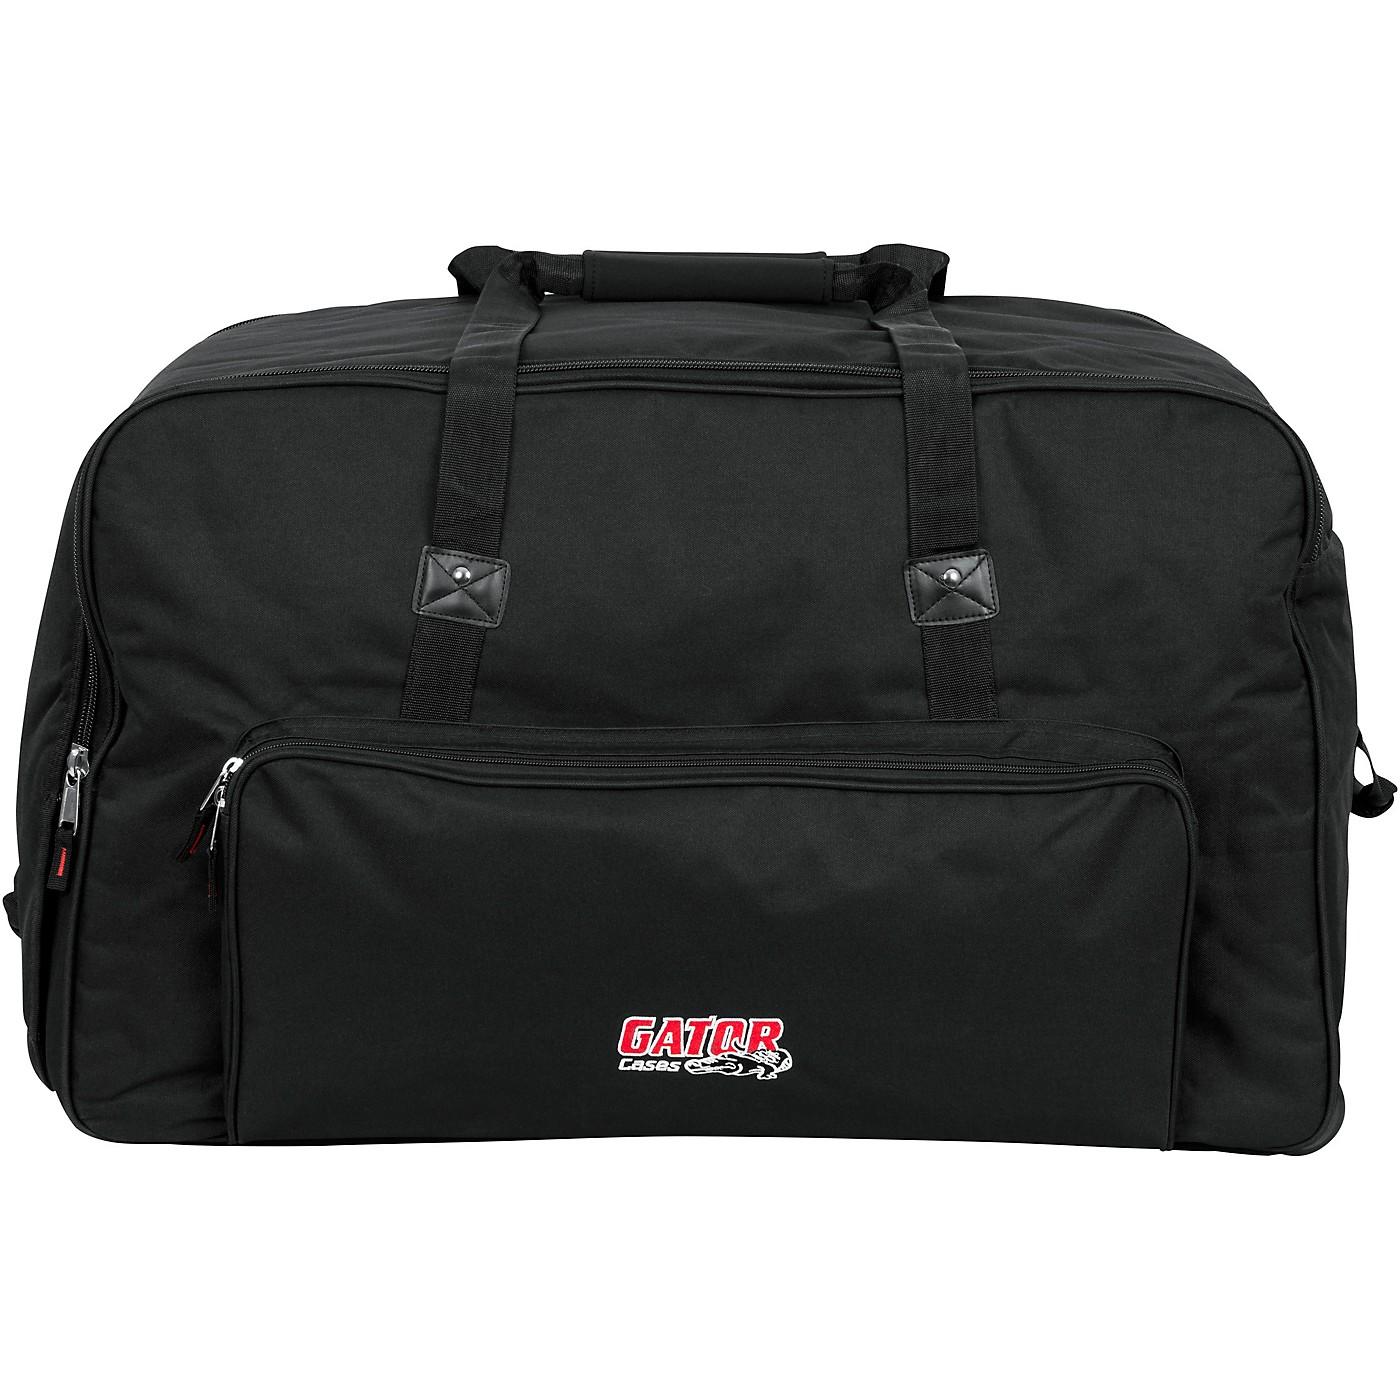 Gator GPA-715 Speaker Bag thumbnail